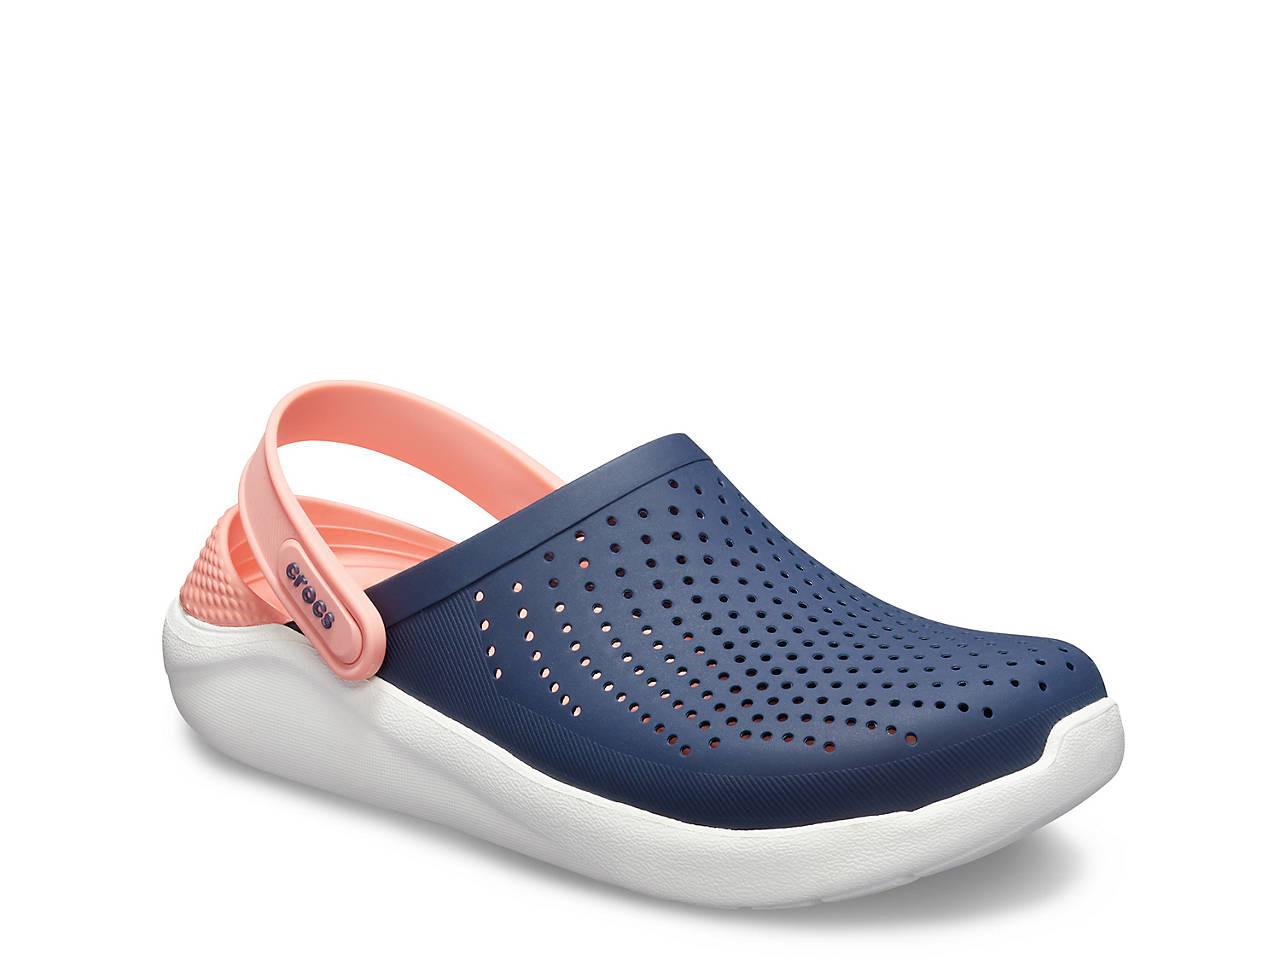 be4988aeae0 Crocs LiteRide Clog Women's Shoes   DSW